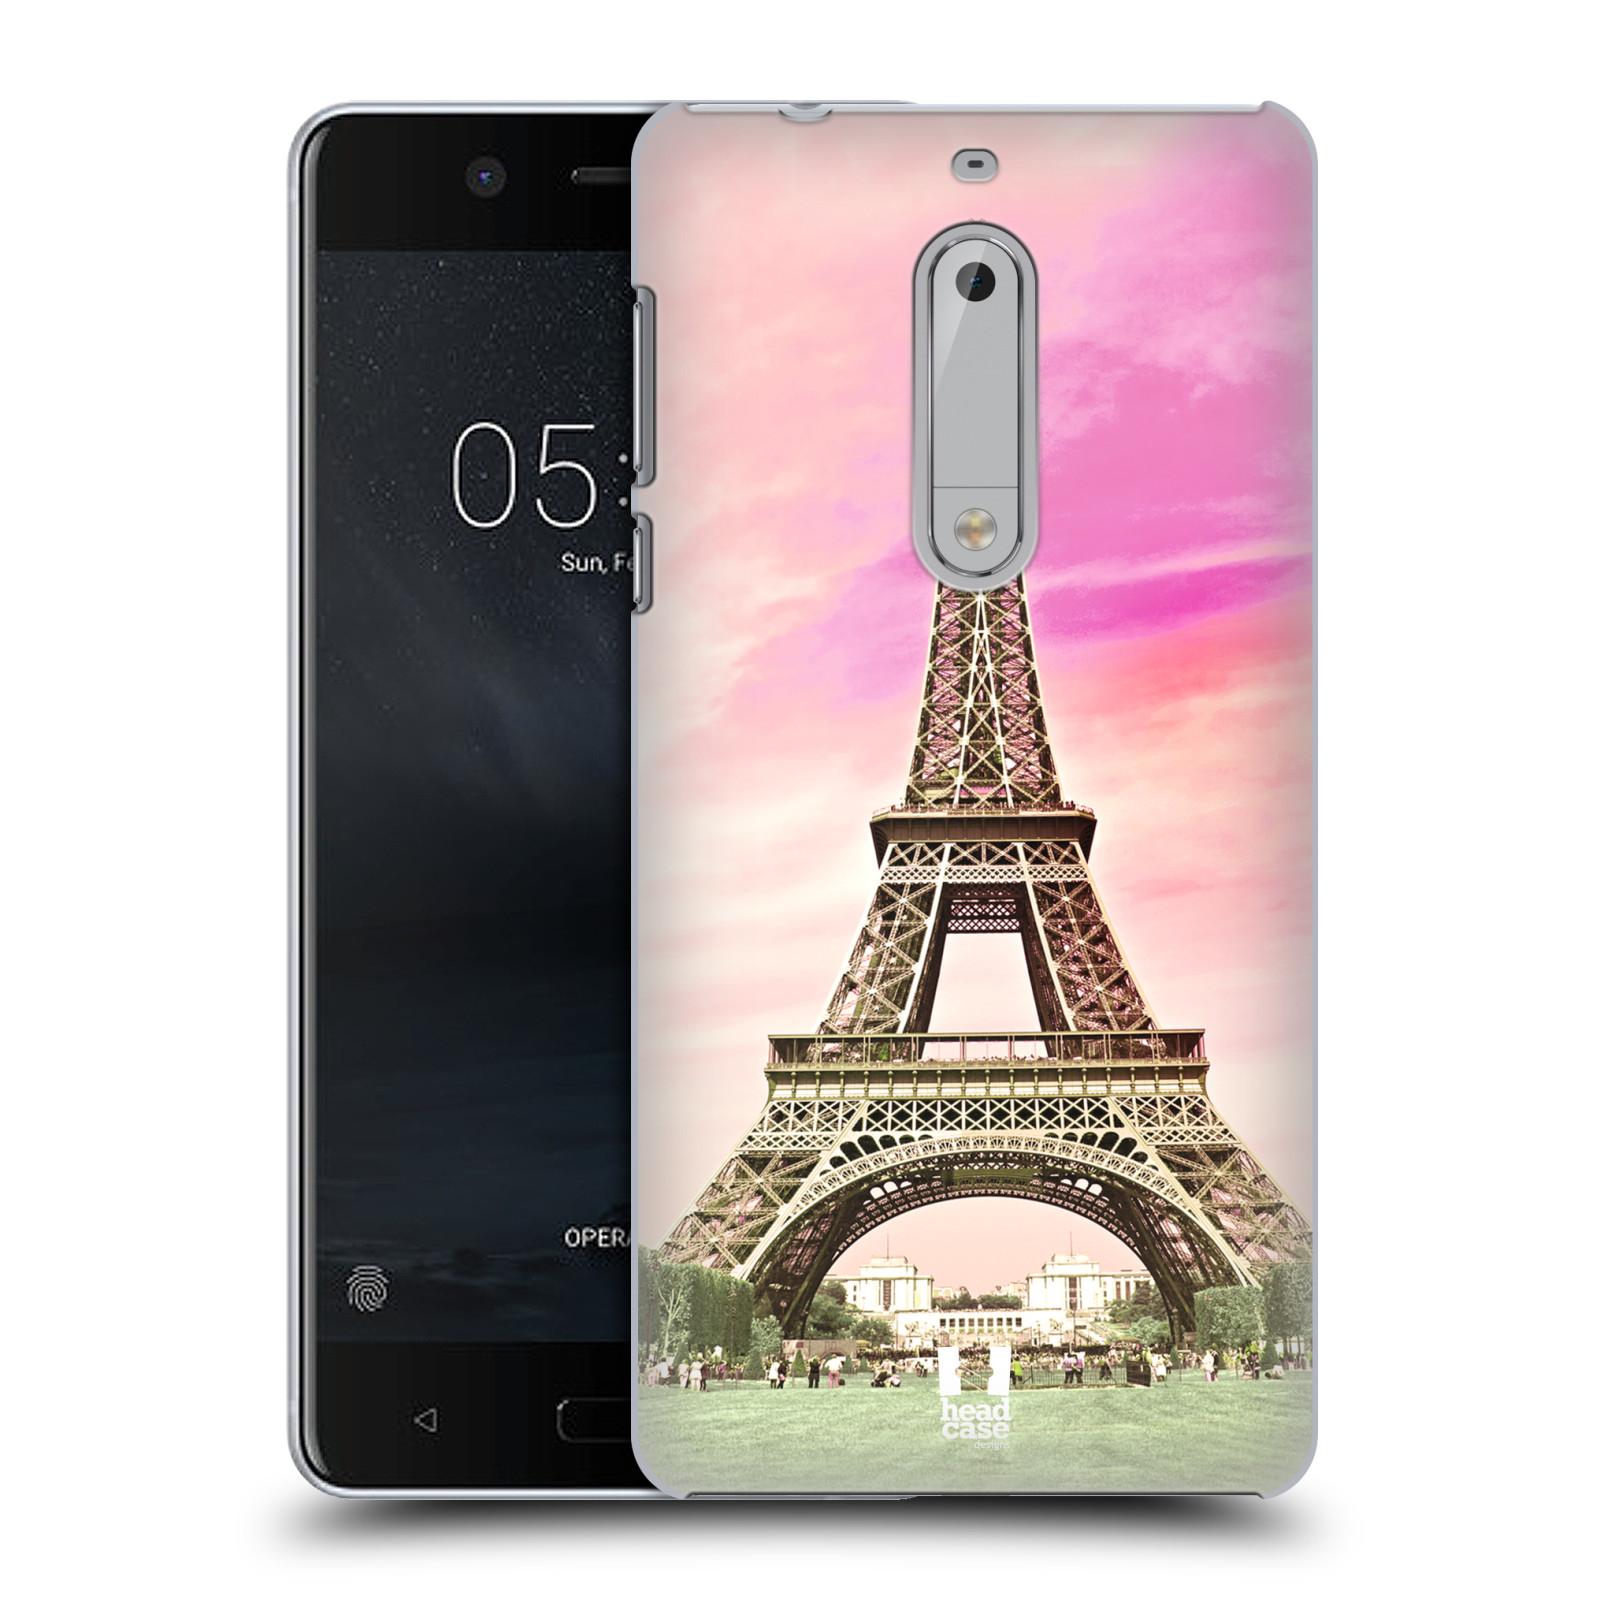 Plastové pouzdro na mobil Nokia 5 Head Case - RŮŽOVÁ AIFELOVKA (Plastový kryt či obal na mobilní telefon Nokia 5 (2017))